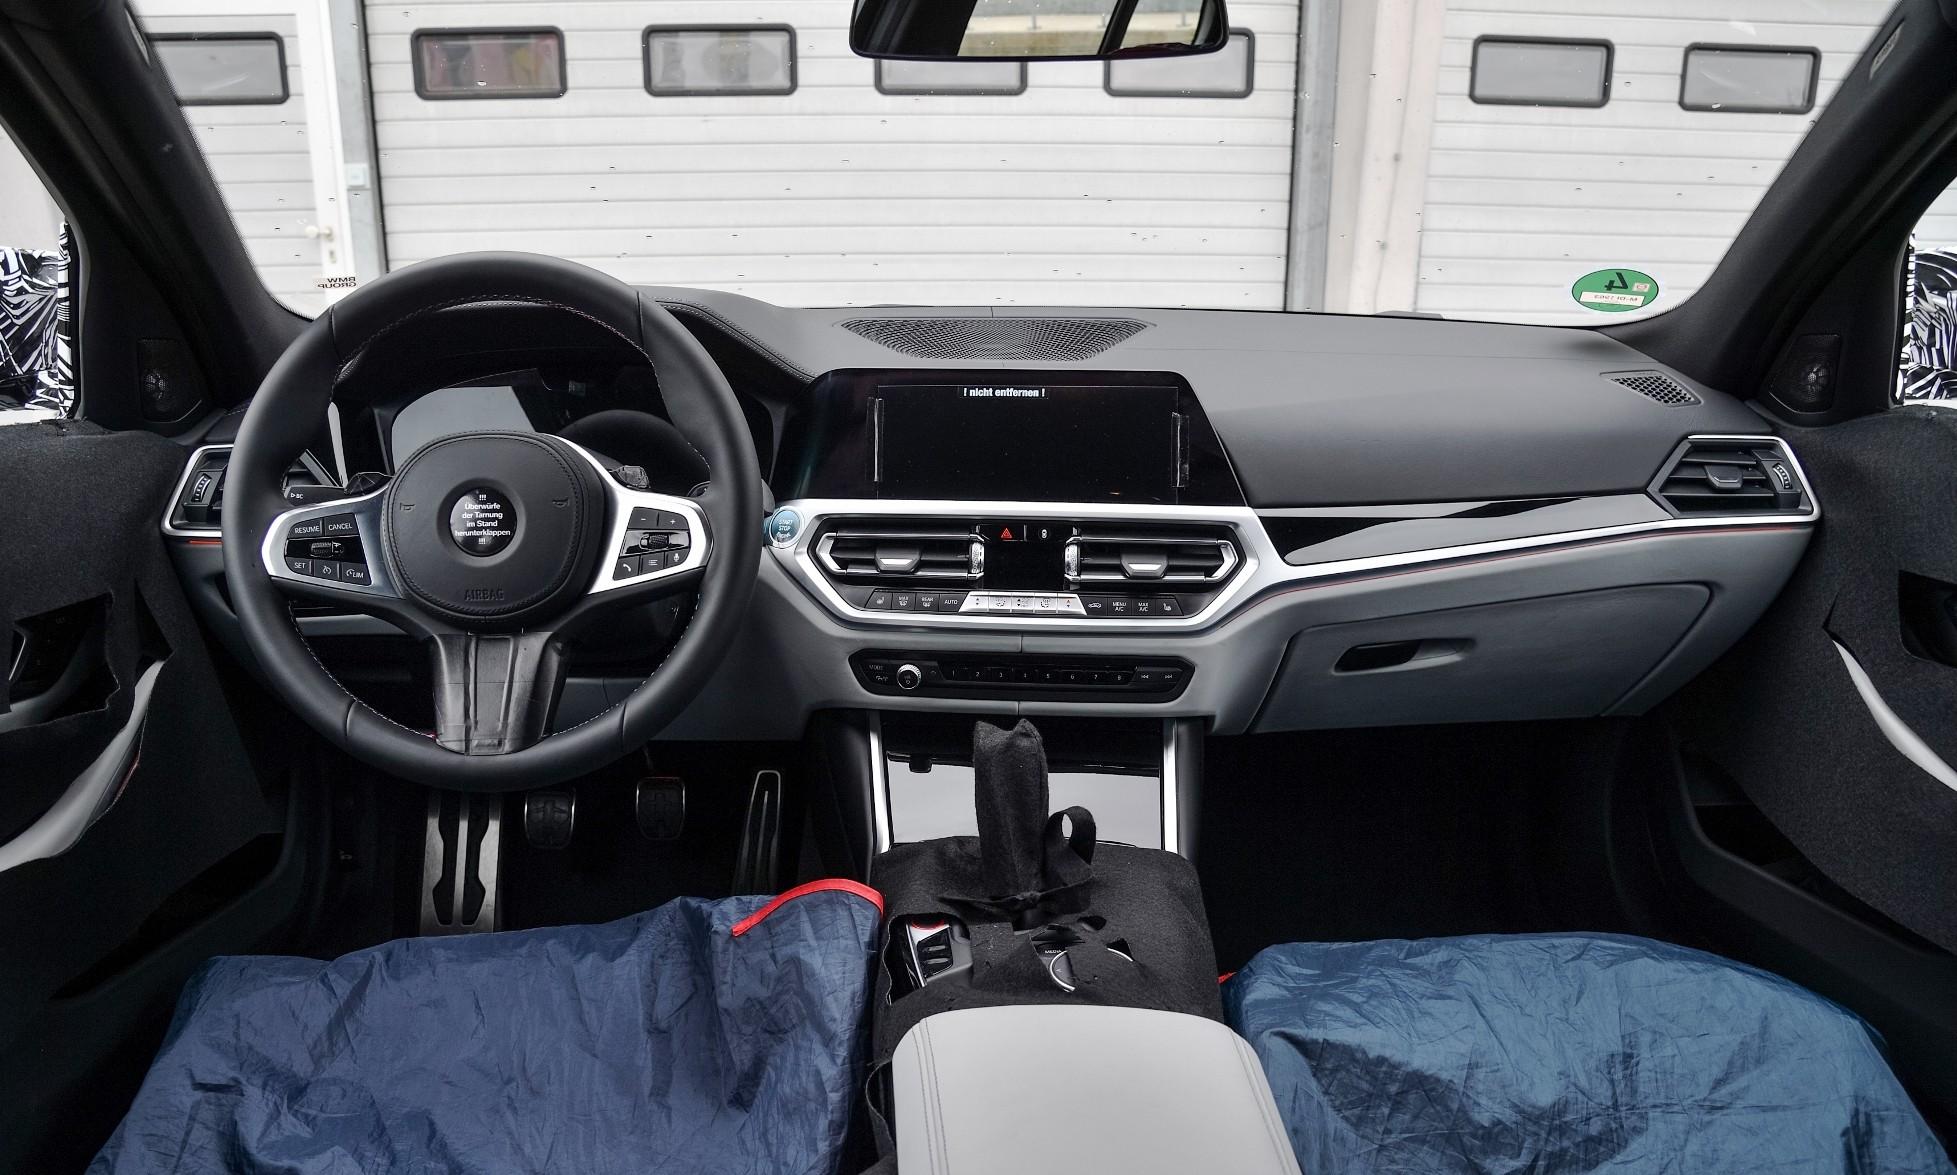 BMW M3 Prototype dashboard